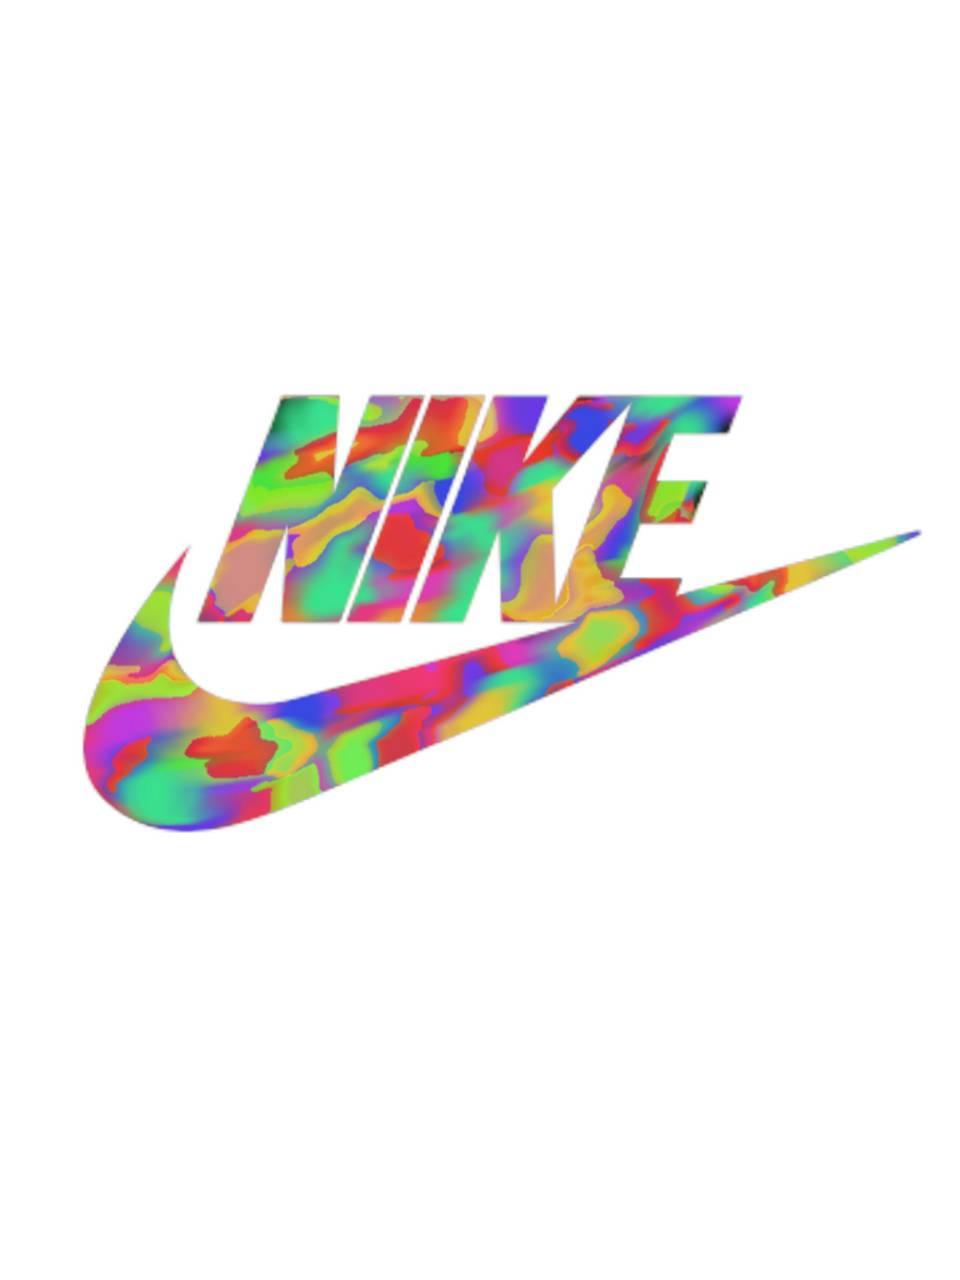 Nike Colors 2